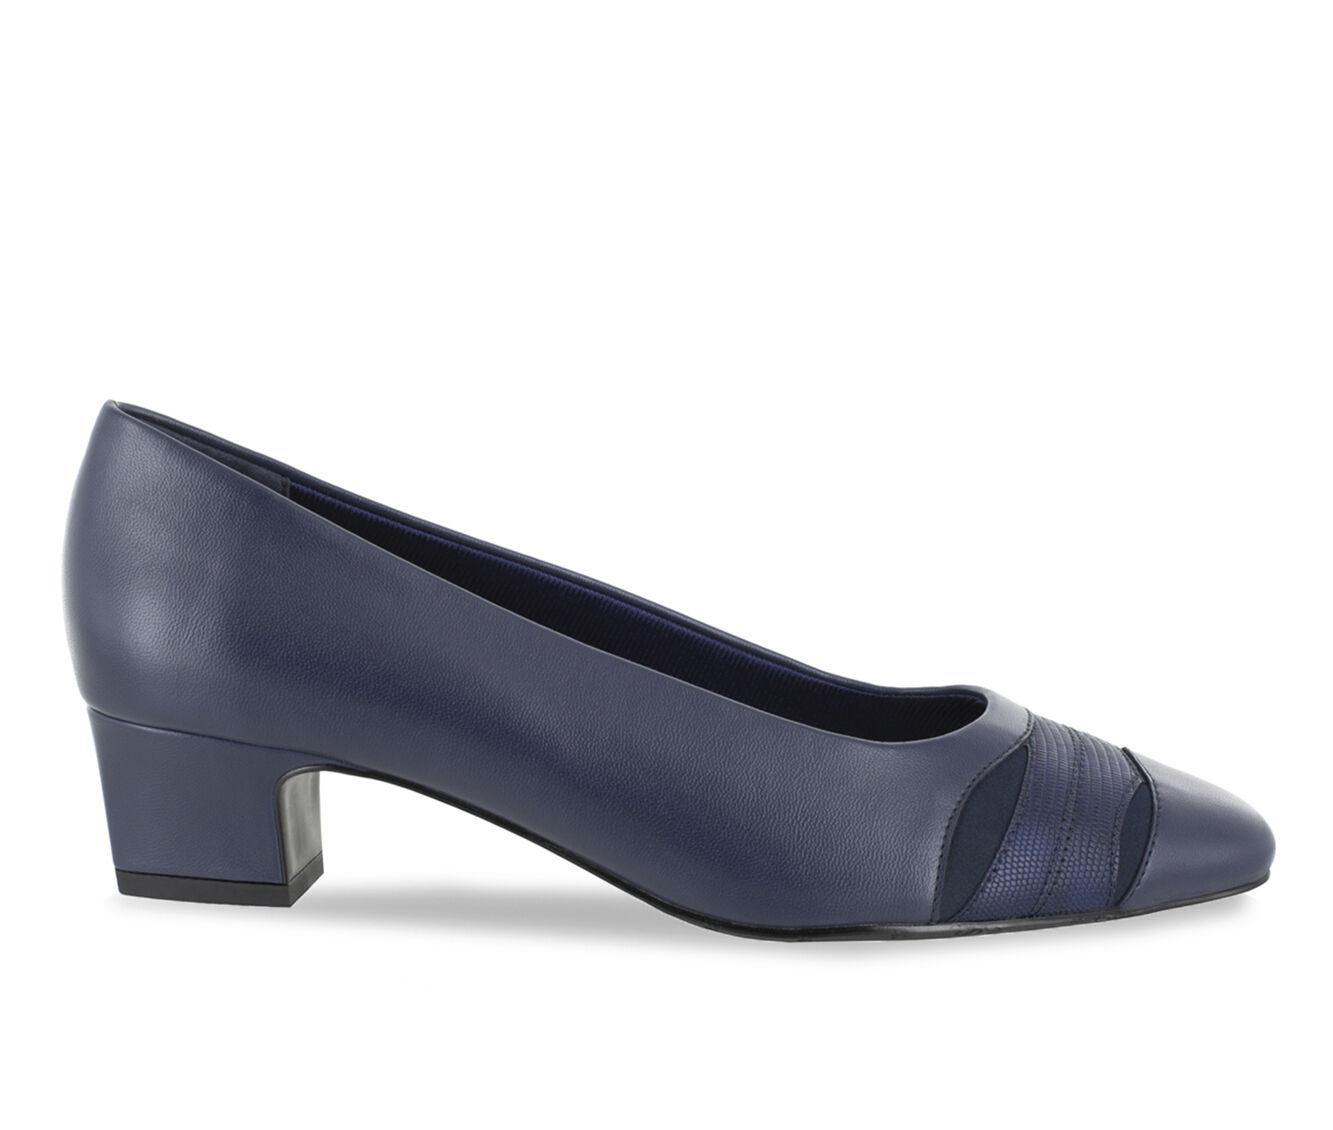 uk shoes_kd5803